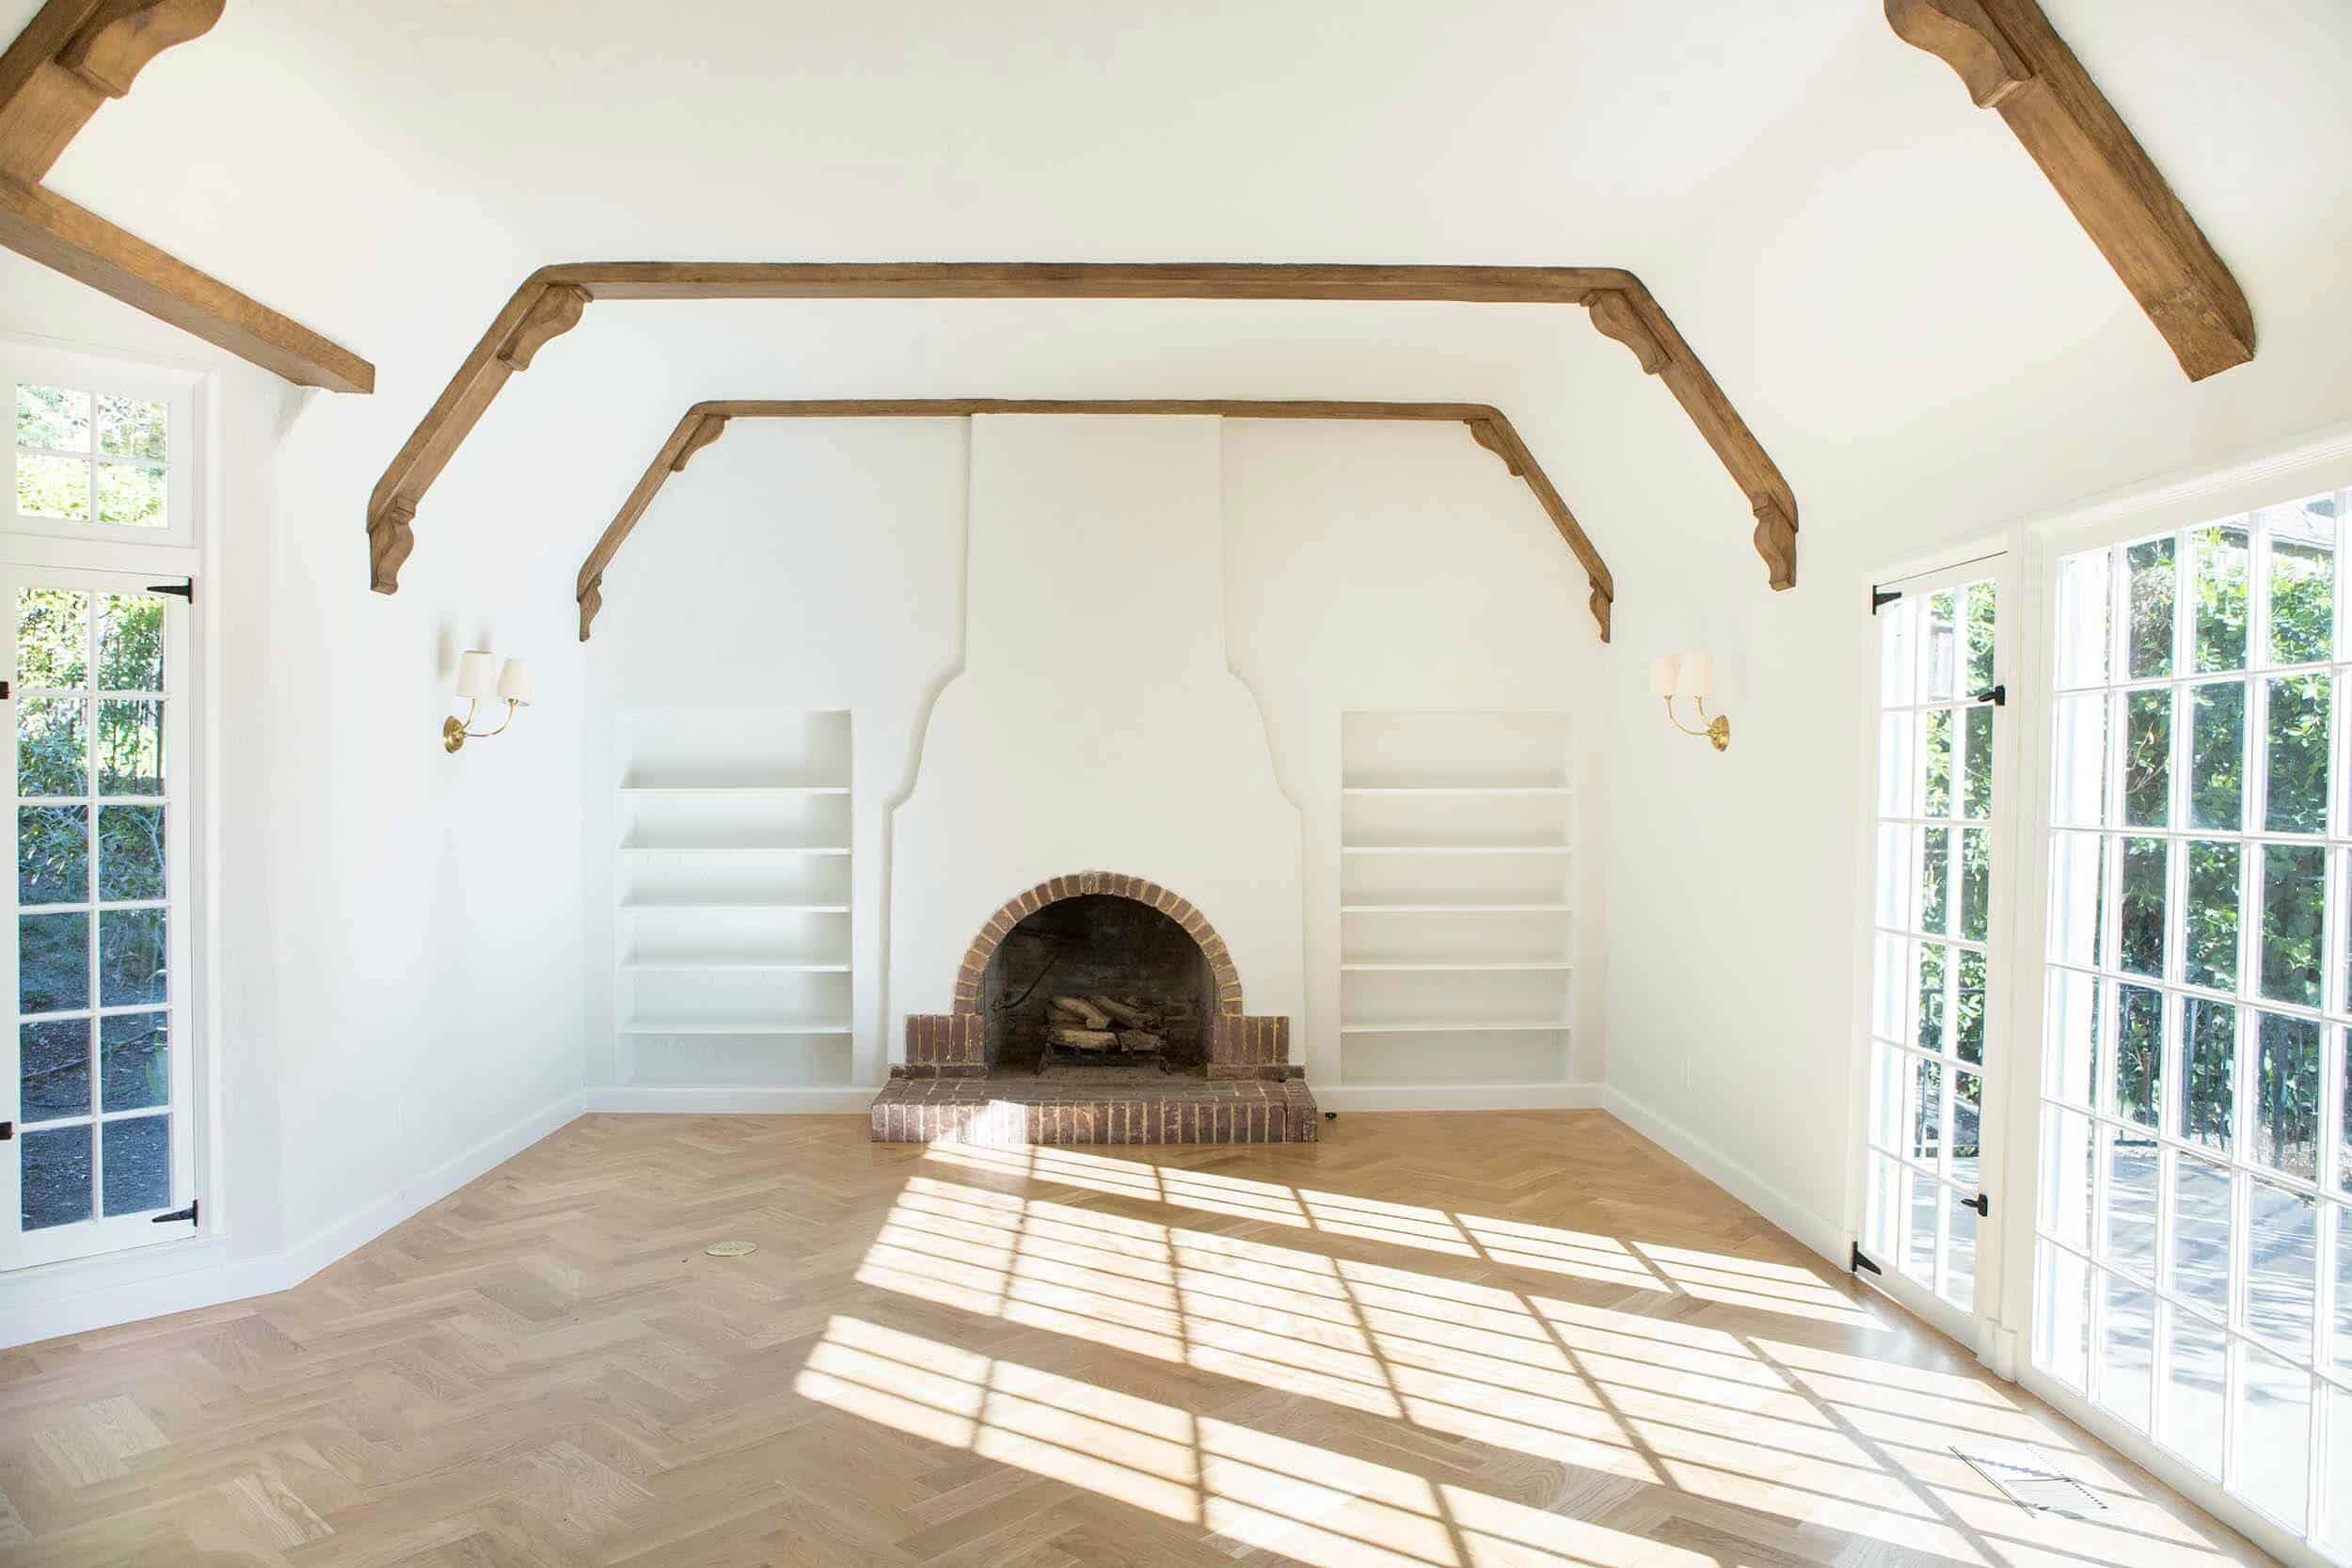 Emily_Henderson_Progress_Wood_Floors_Living_Room_No Text